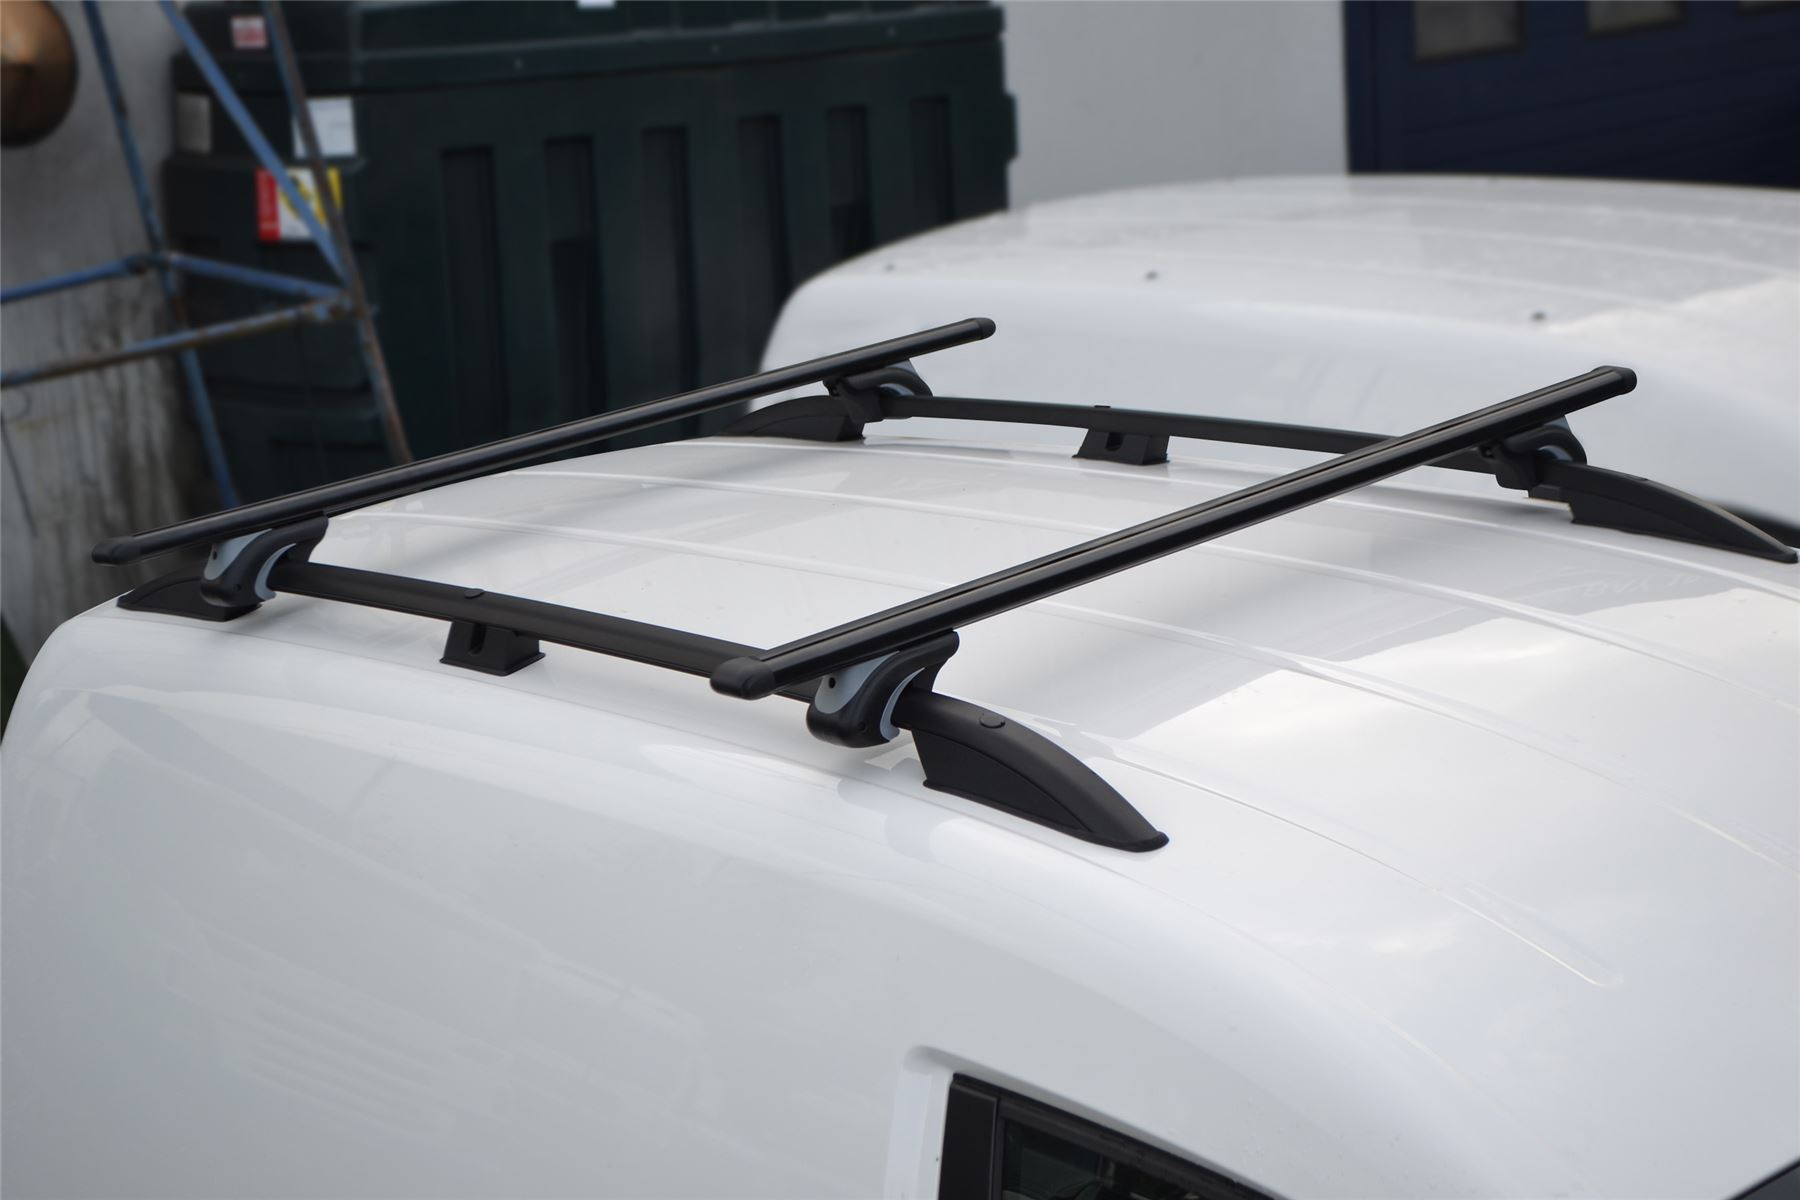 CROSS BARS FOR VW CADDY SWB 2010-ONWARDS LTS AUTO BLACK ROOF RAILS BARS RACKS